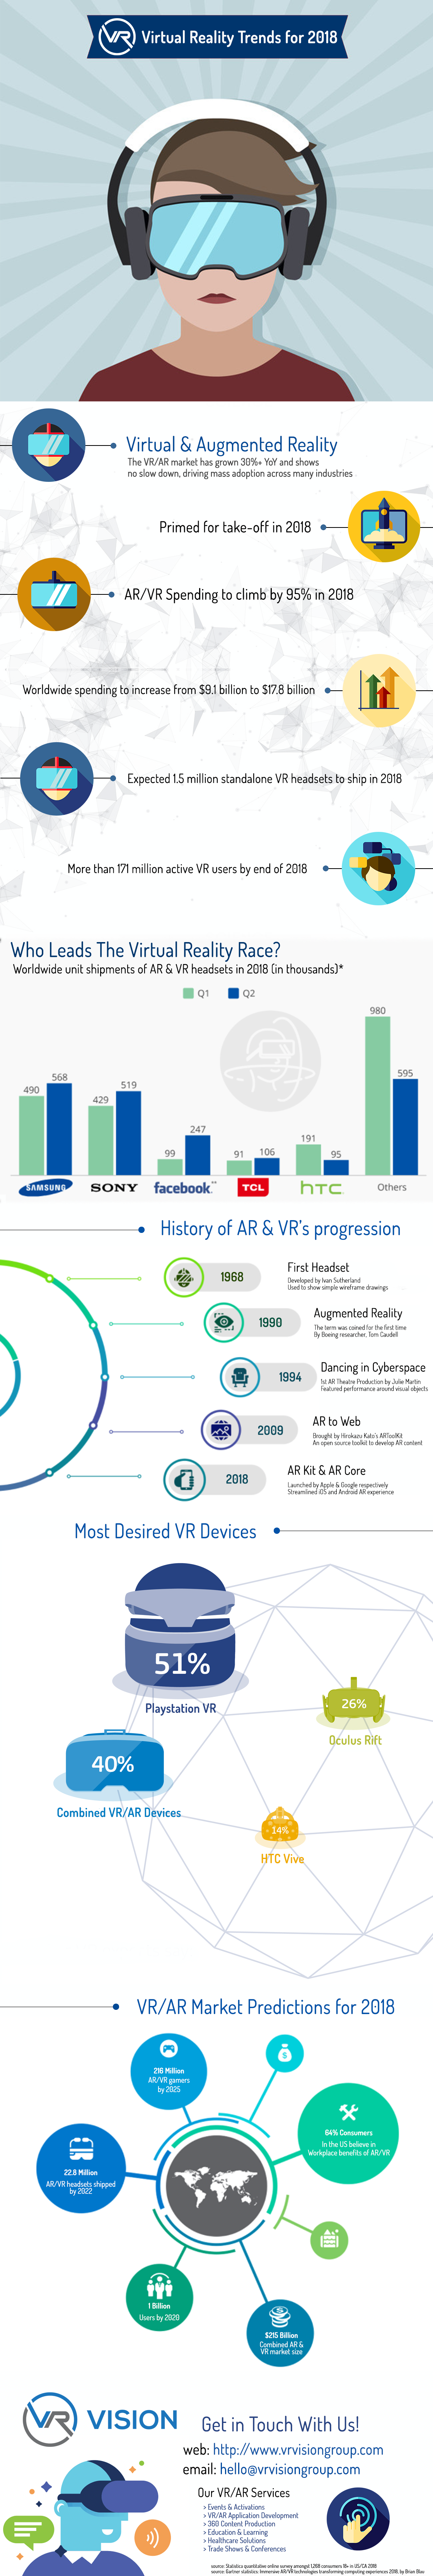 vr-vision-infographic-2018